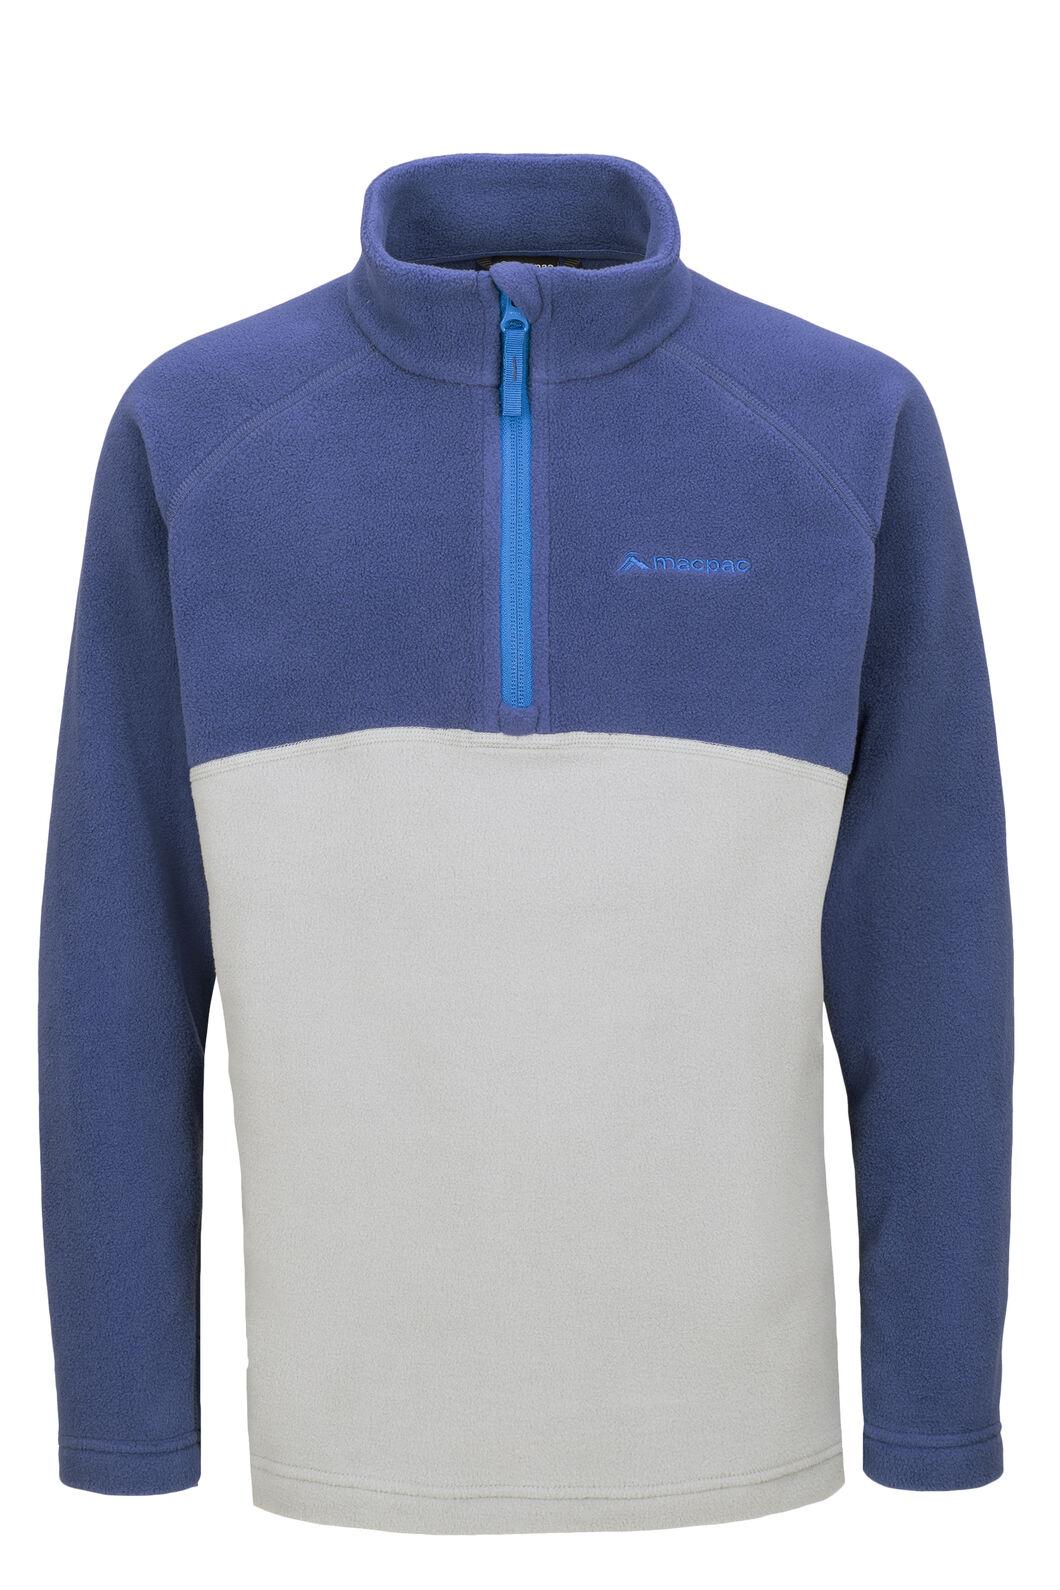 Macpac Tui Polartec® Fleece Pullover — Kids', Blueprint/Monument, hi-res